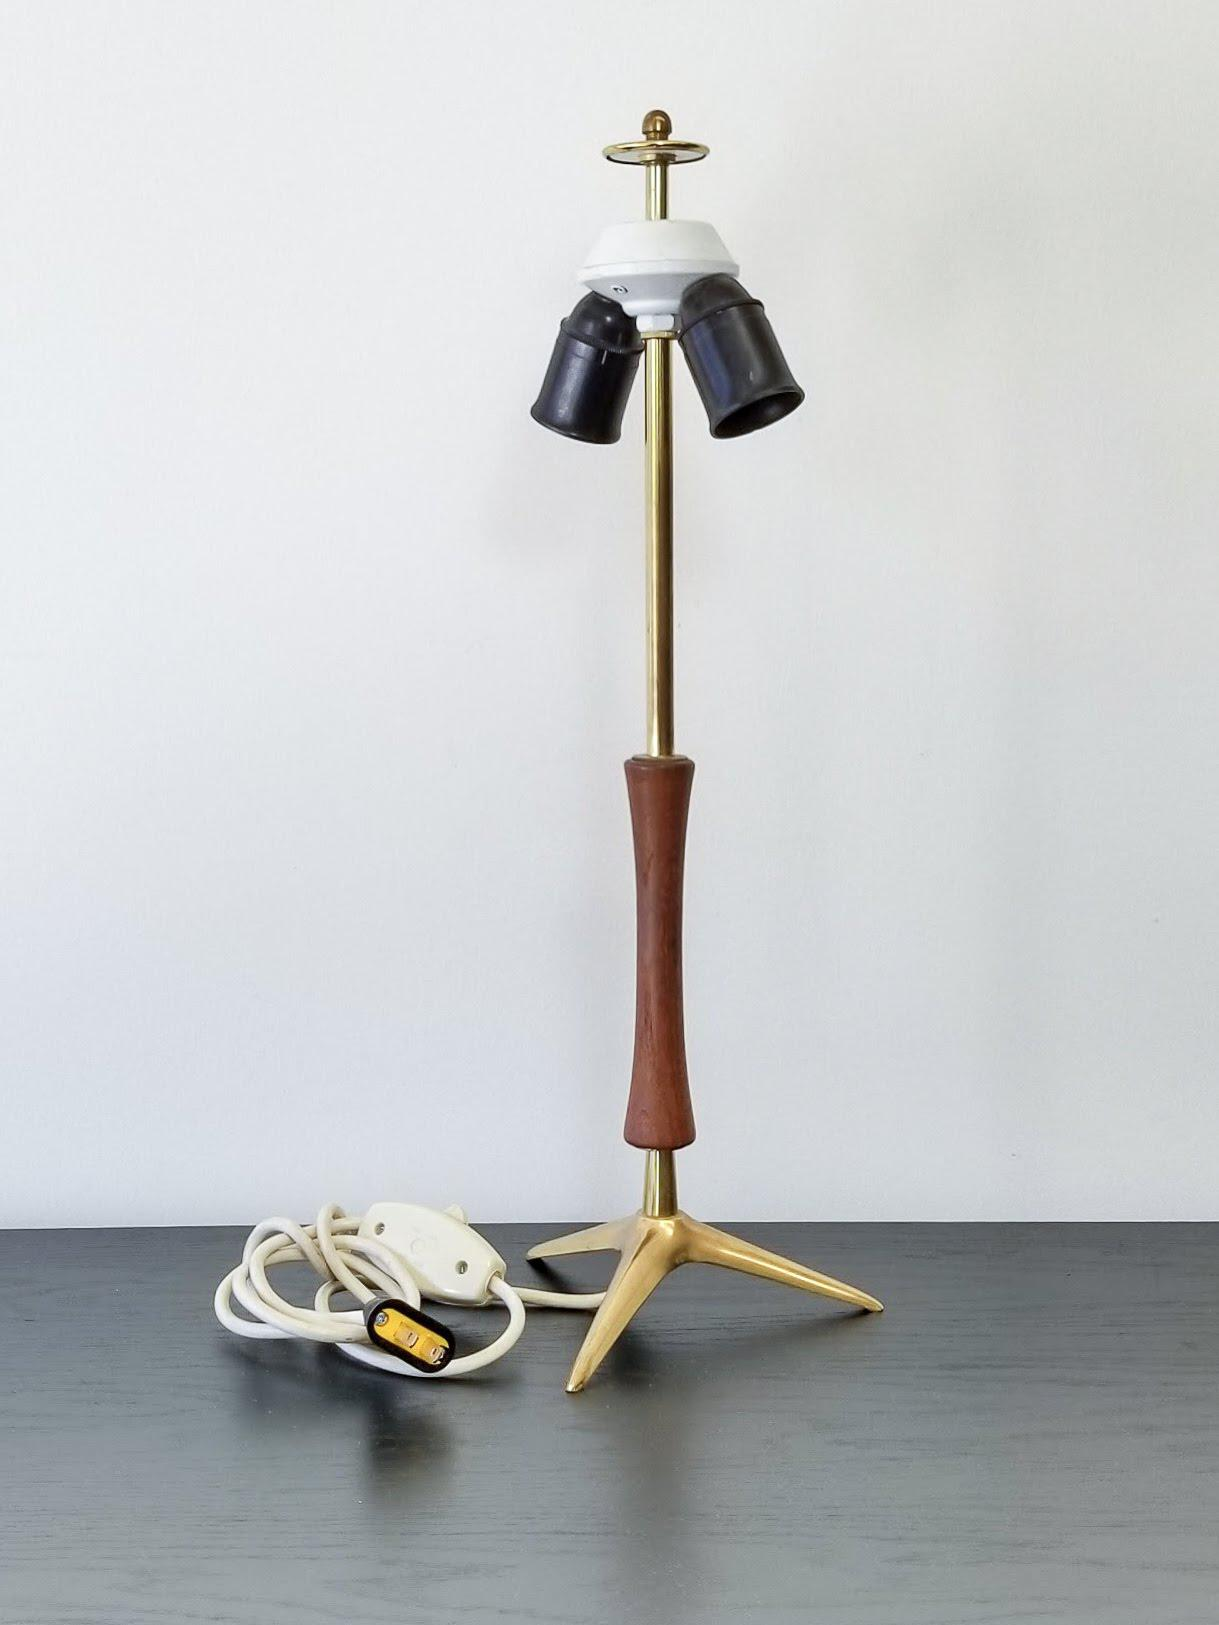 1950s Mid Century Modern Brass Tripod Table Lamp Chairish